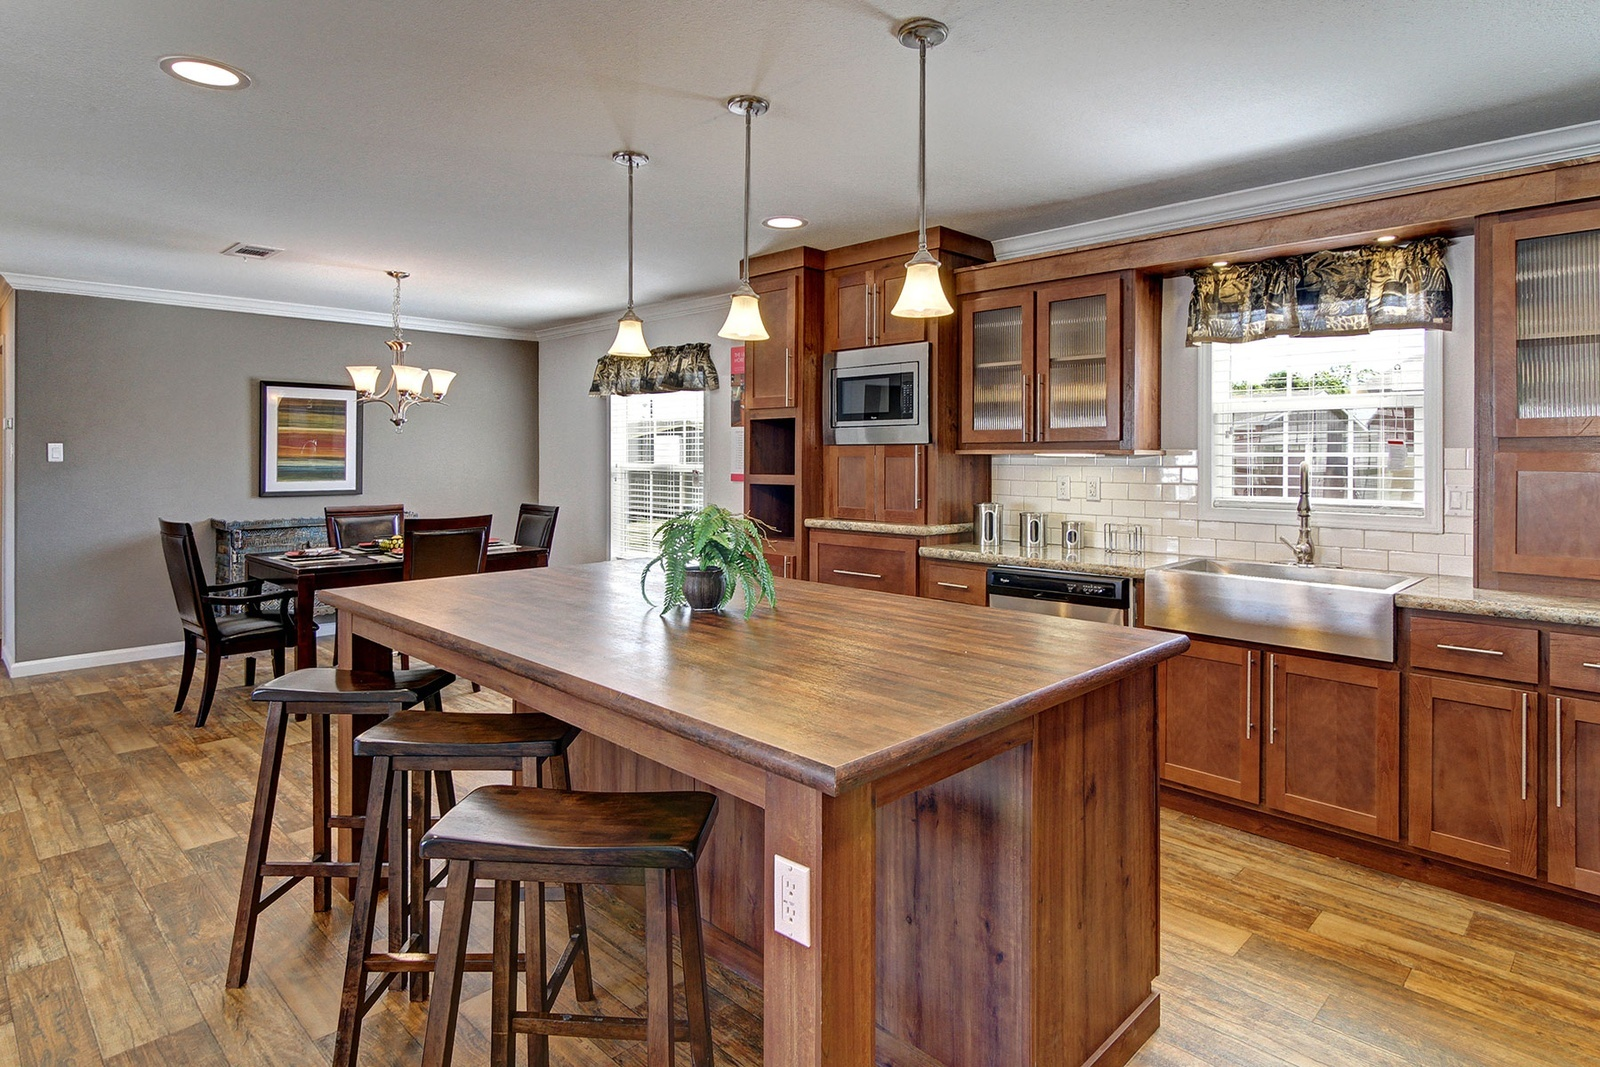 hillcrest-ultimate-kitchen2-2-1600x1067.jpg